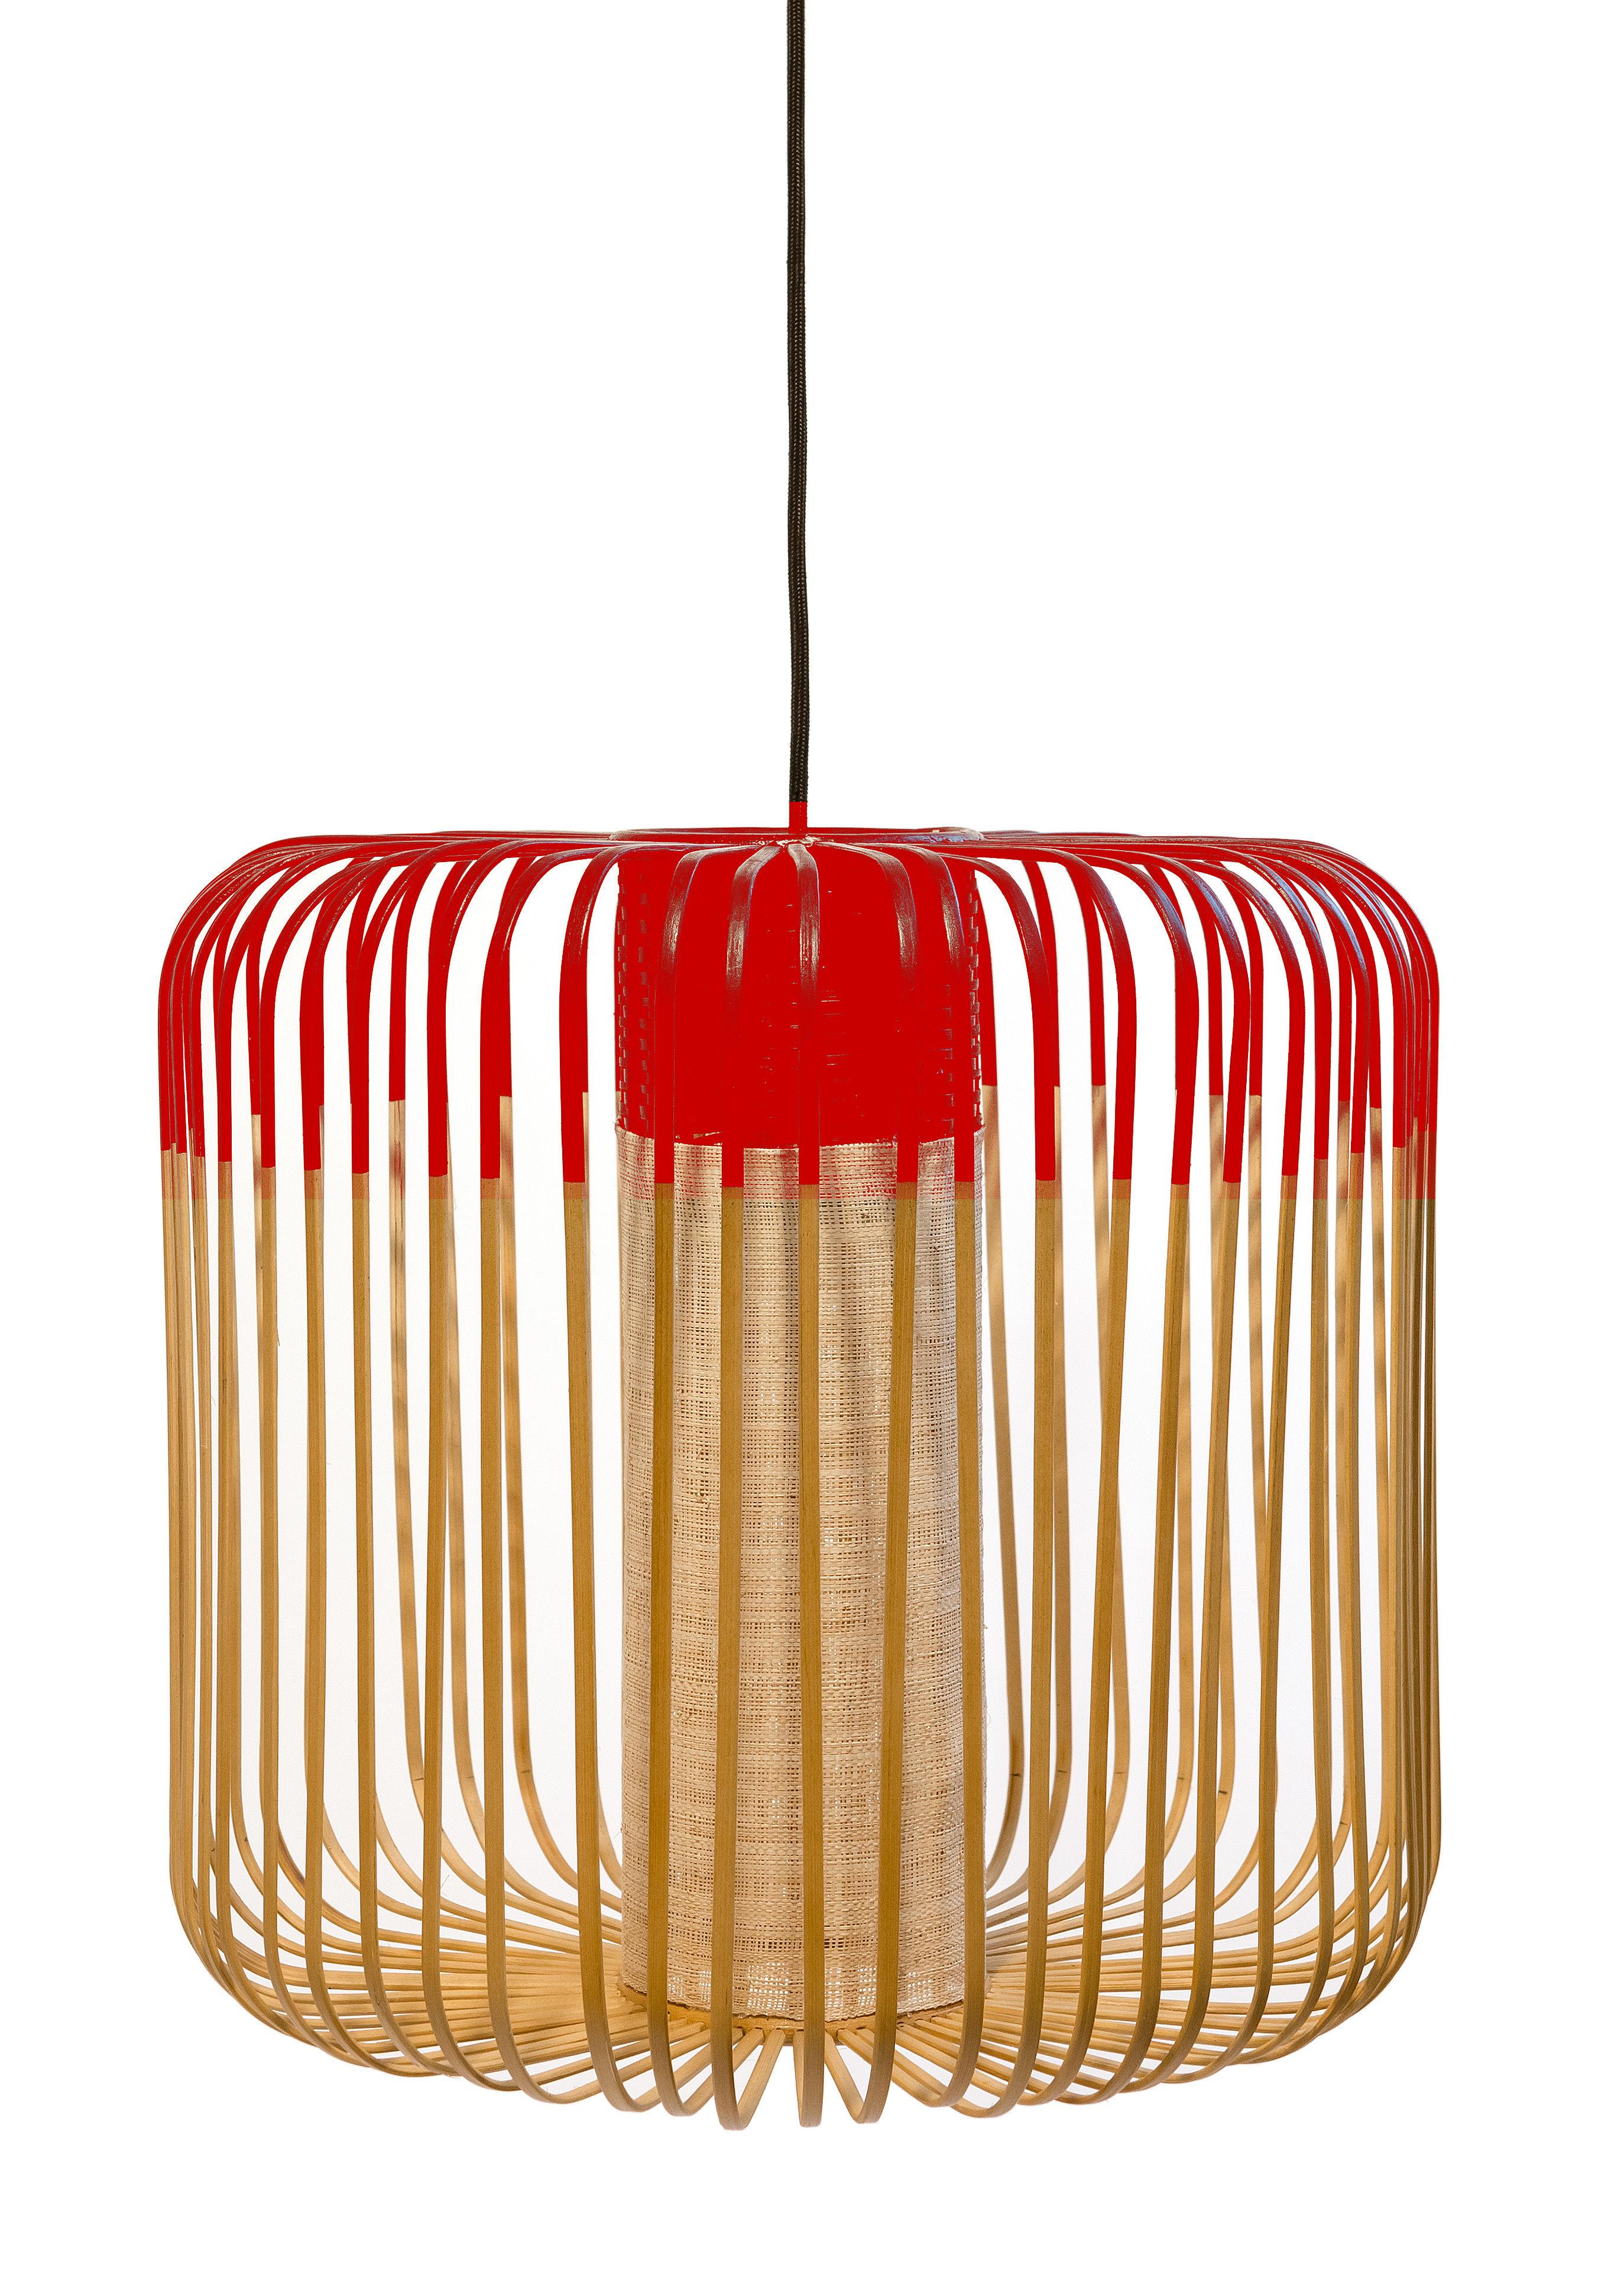 Leuchten - Pendelleuchten - Bamboo Light M Pendelleuchte / H 40 cm x Ø 45 cm - Forestier - Rot / natur - Gewebe, Metall, Naturbambus